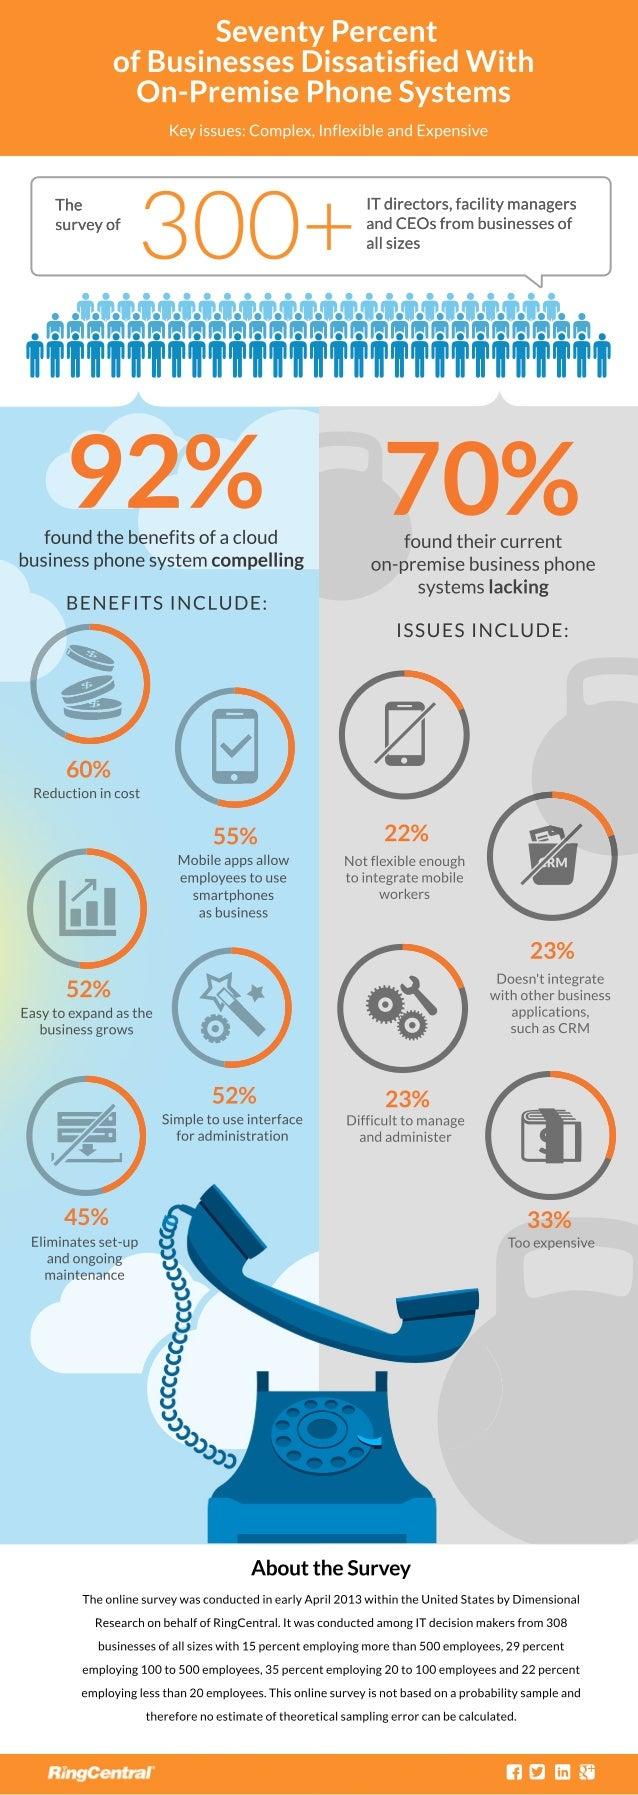 SeventyPercent ofBusinessesDissatisfiedWith On-PremisePhoneSystems Keyissues:Complex,InflexibleandExpensive 300+ ITdirecto...